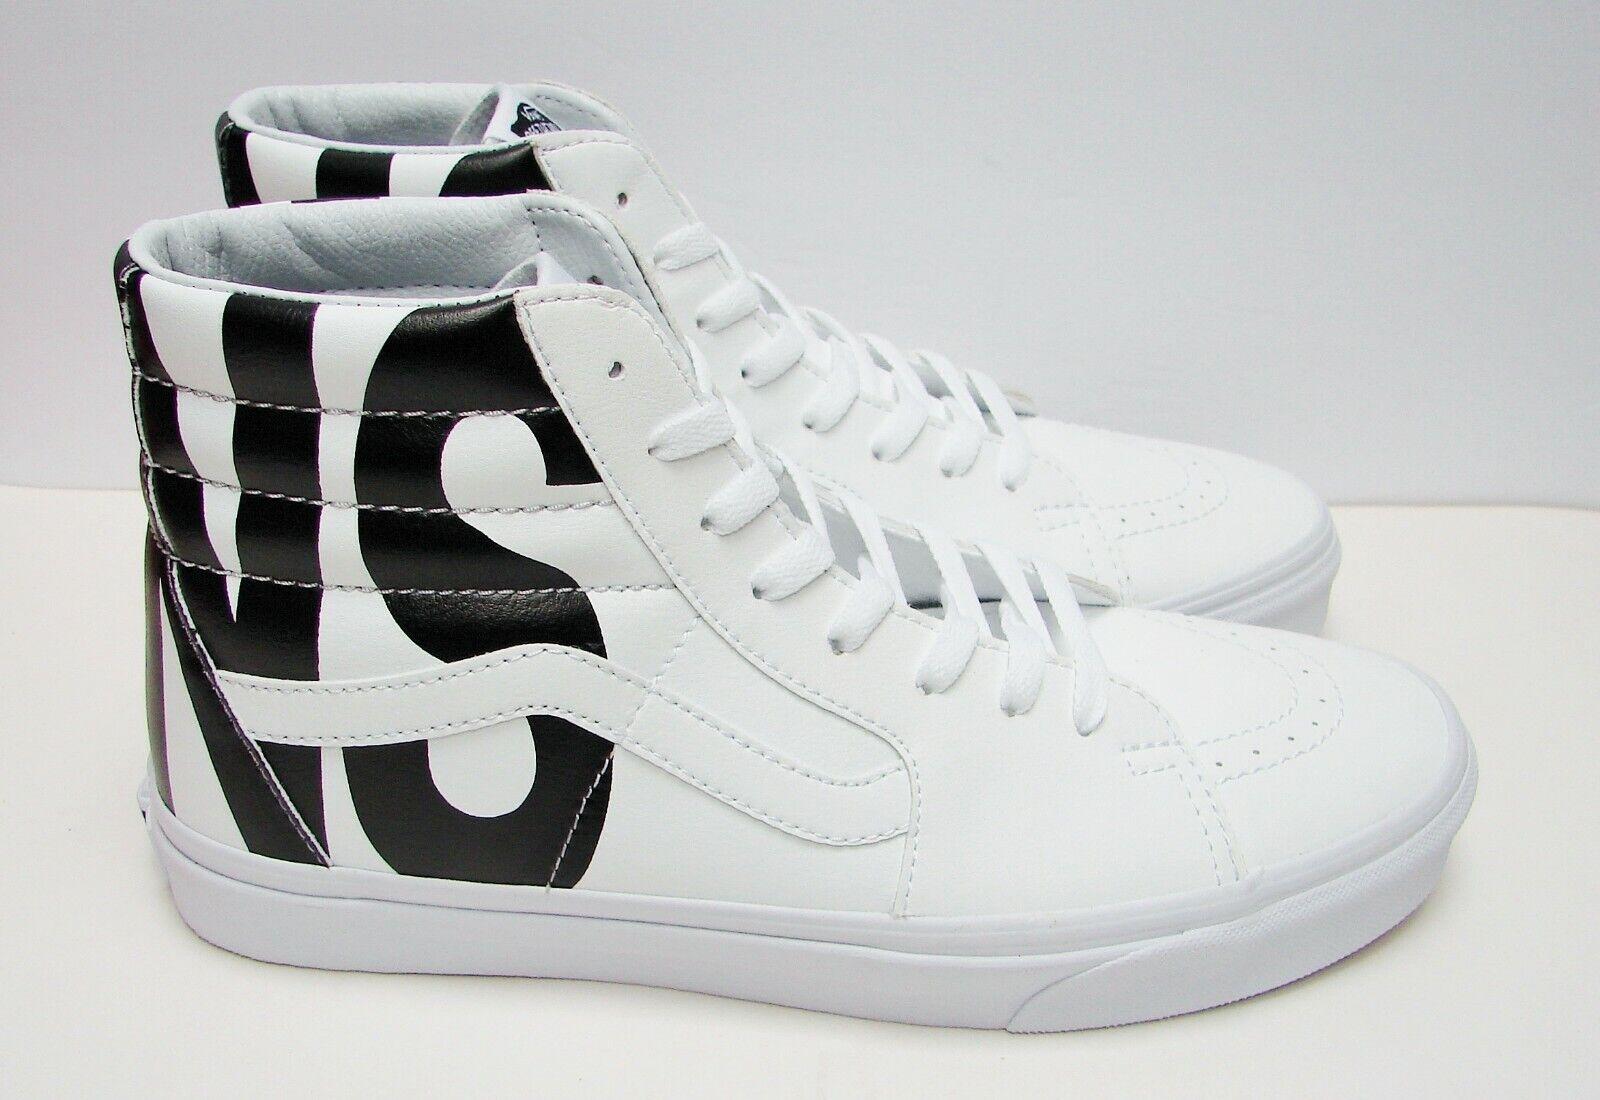 VANS SK8-HI (Classic Tumble) True White VN-0A38GEUBD Men's size  10.5